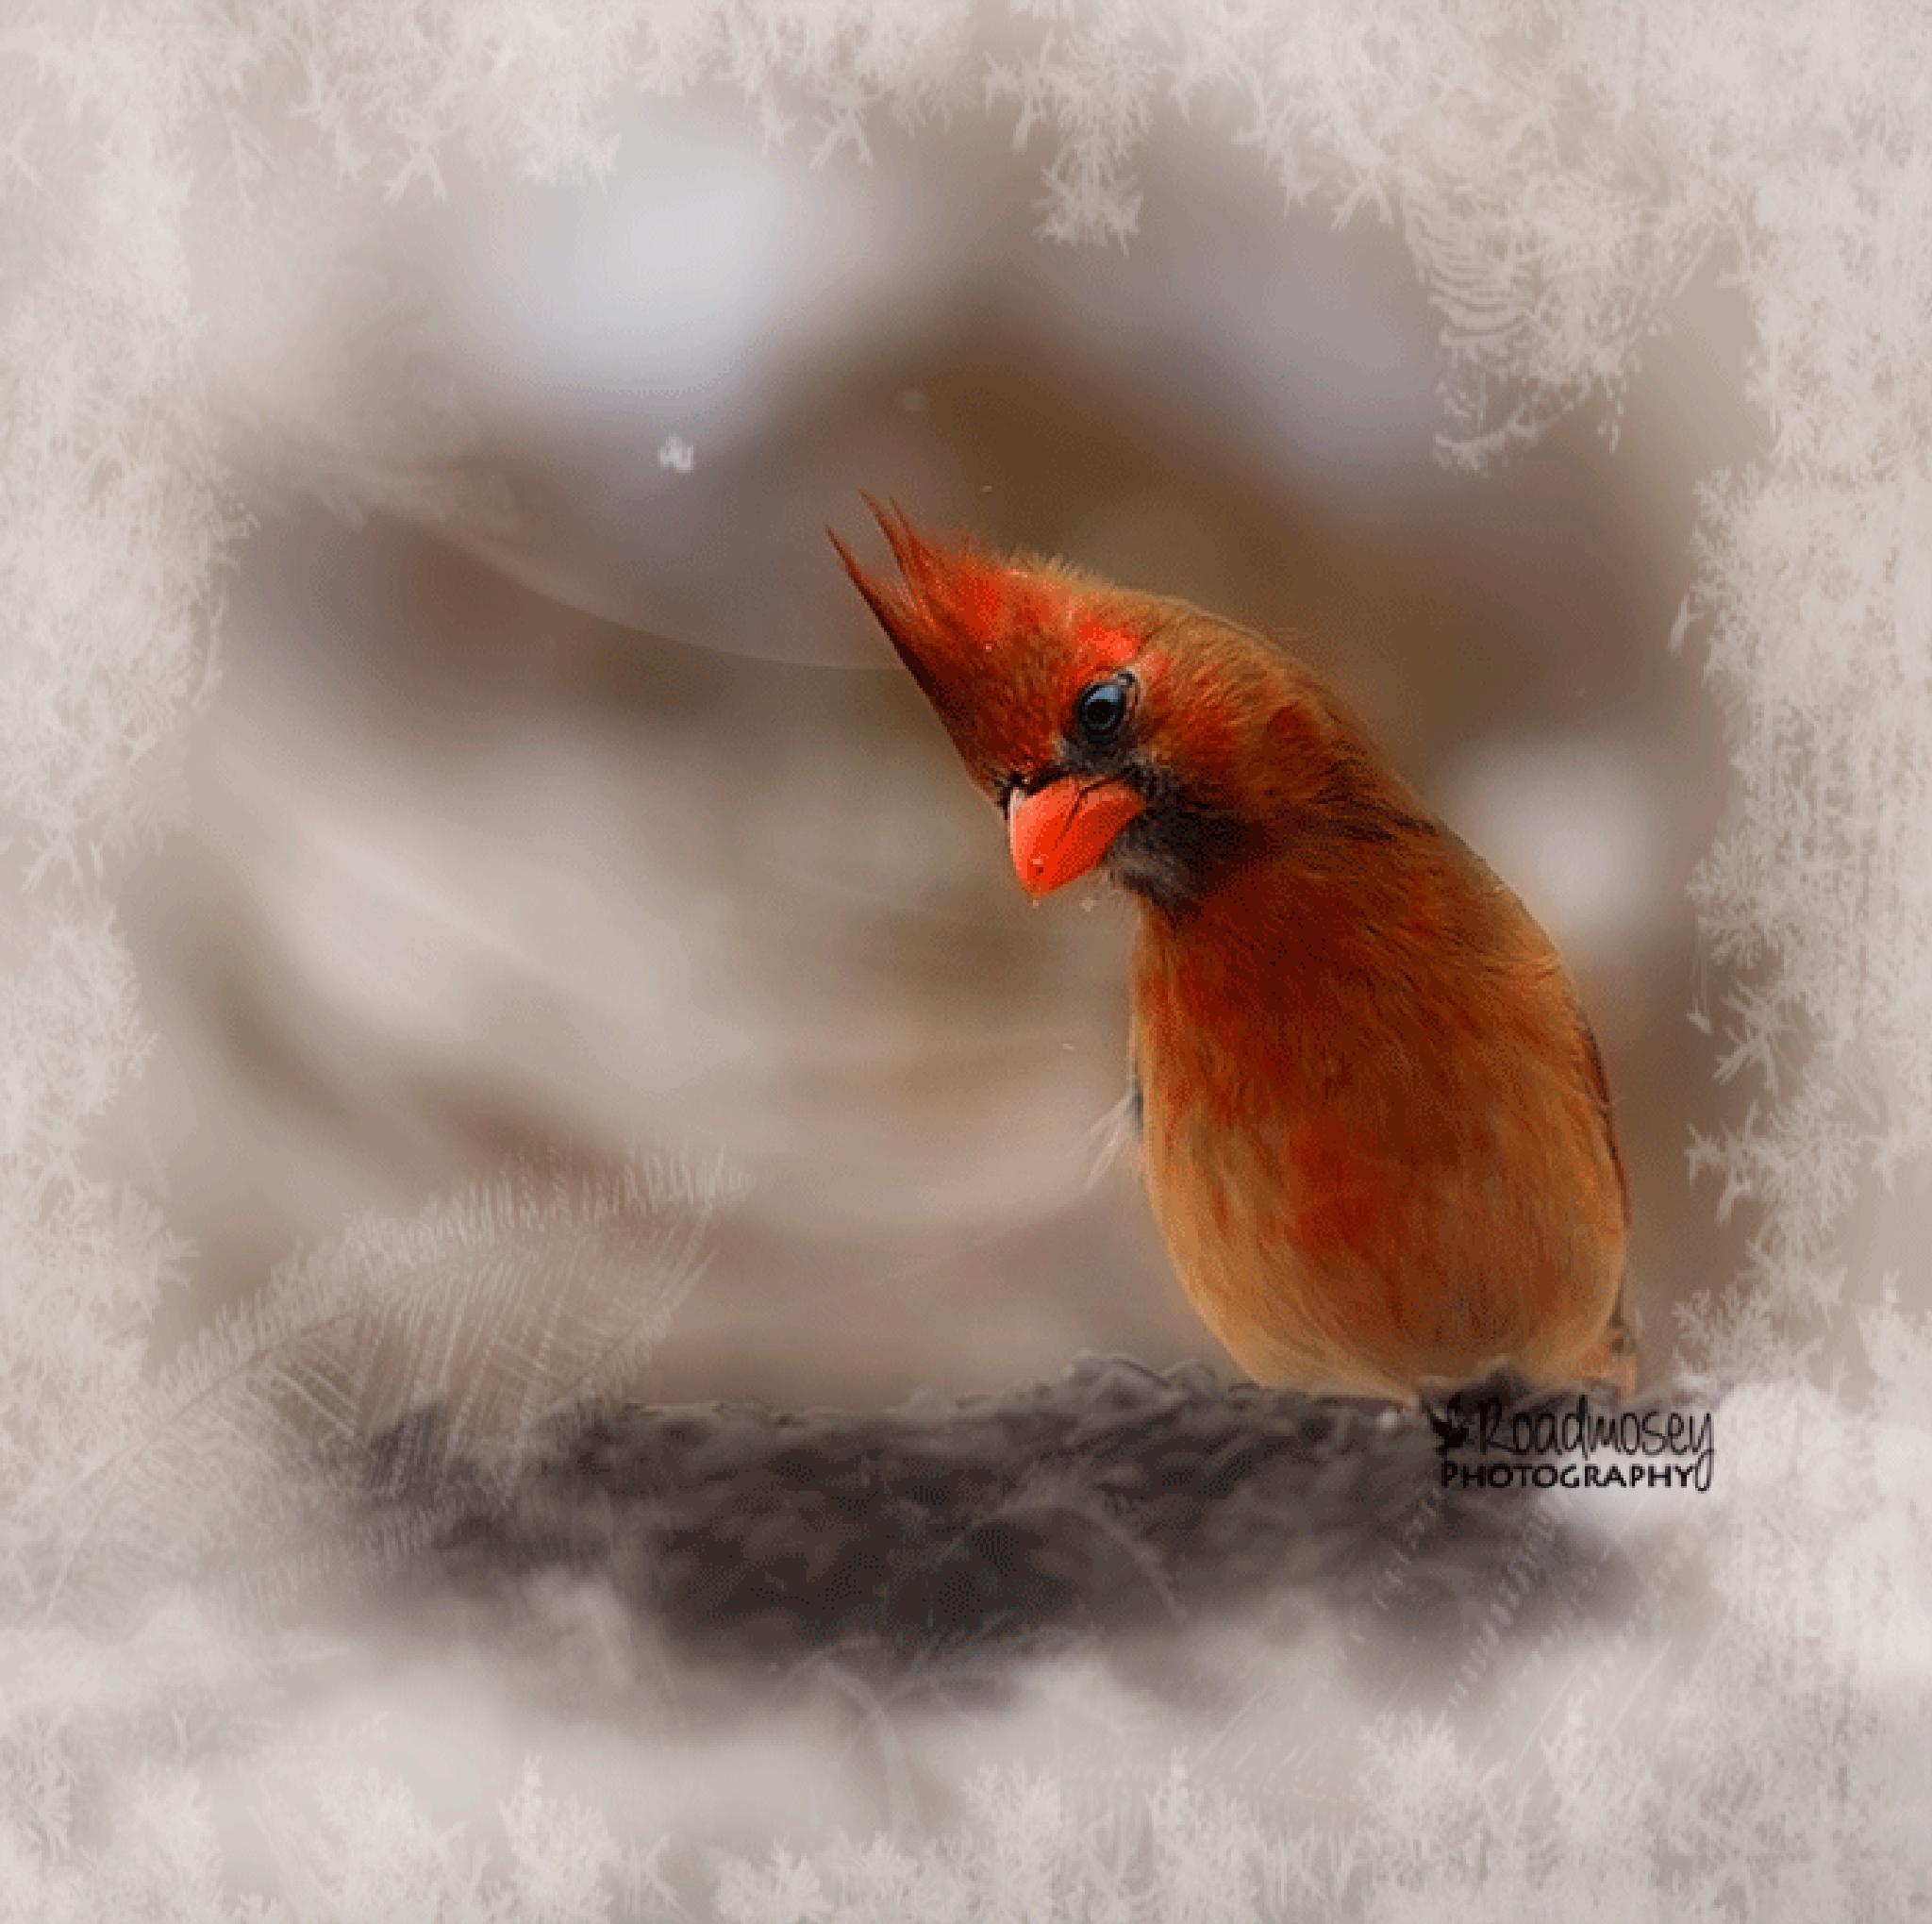 Female Cardinal by Road Mosey Photography - Robin Brandjes